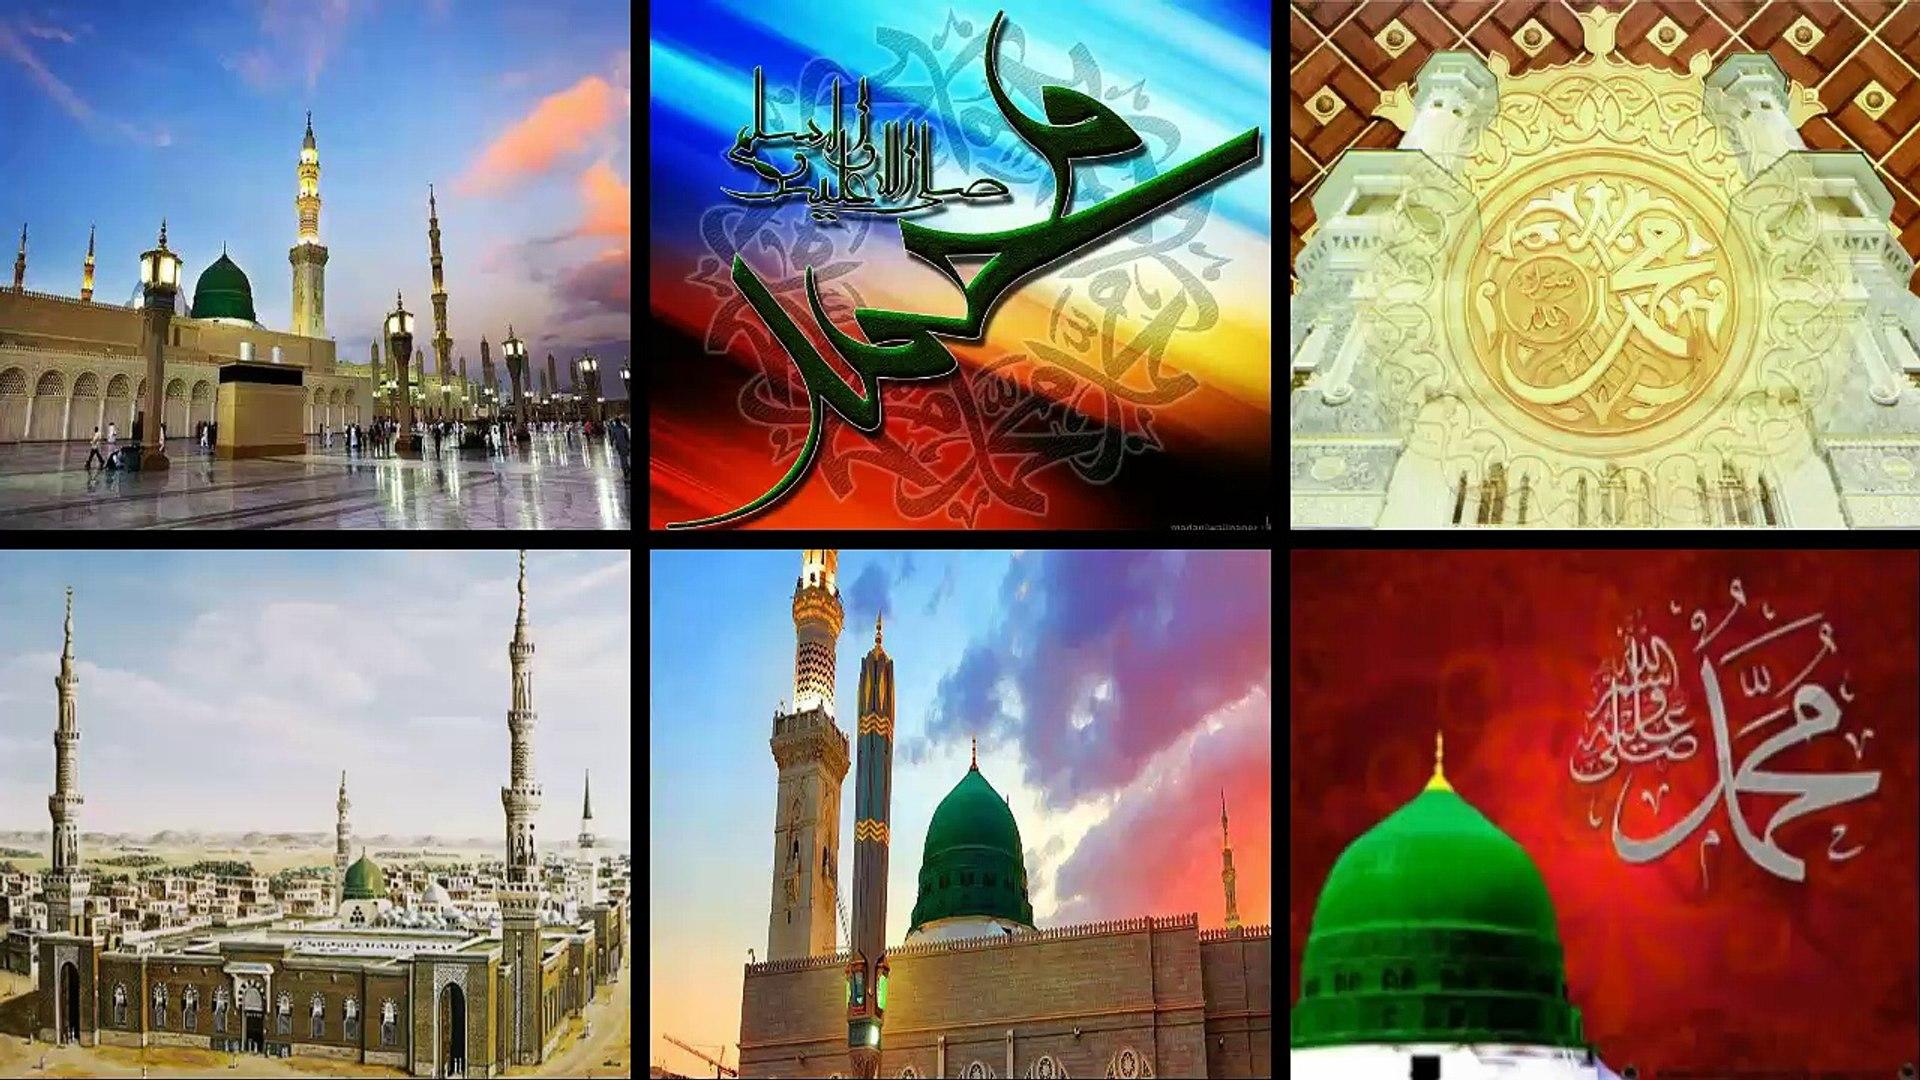 Aae Sabz Gunbad Waly Beautiful naat e Rasool SAW LAST RECITED BY AMJAB SABRI